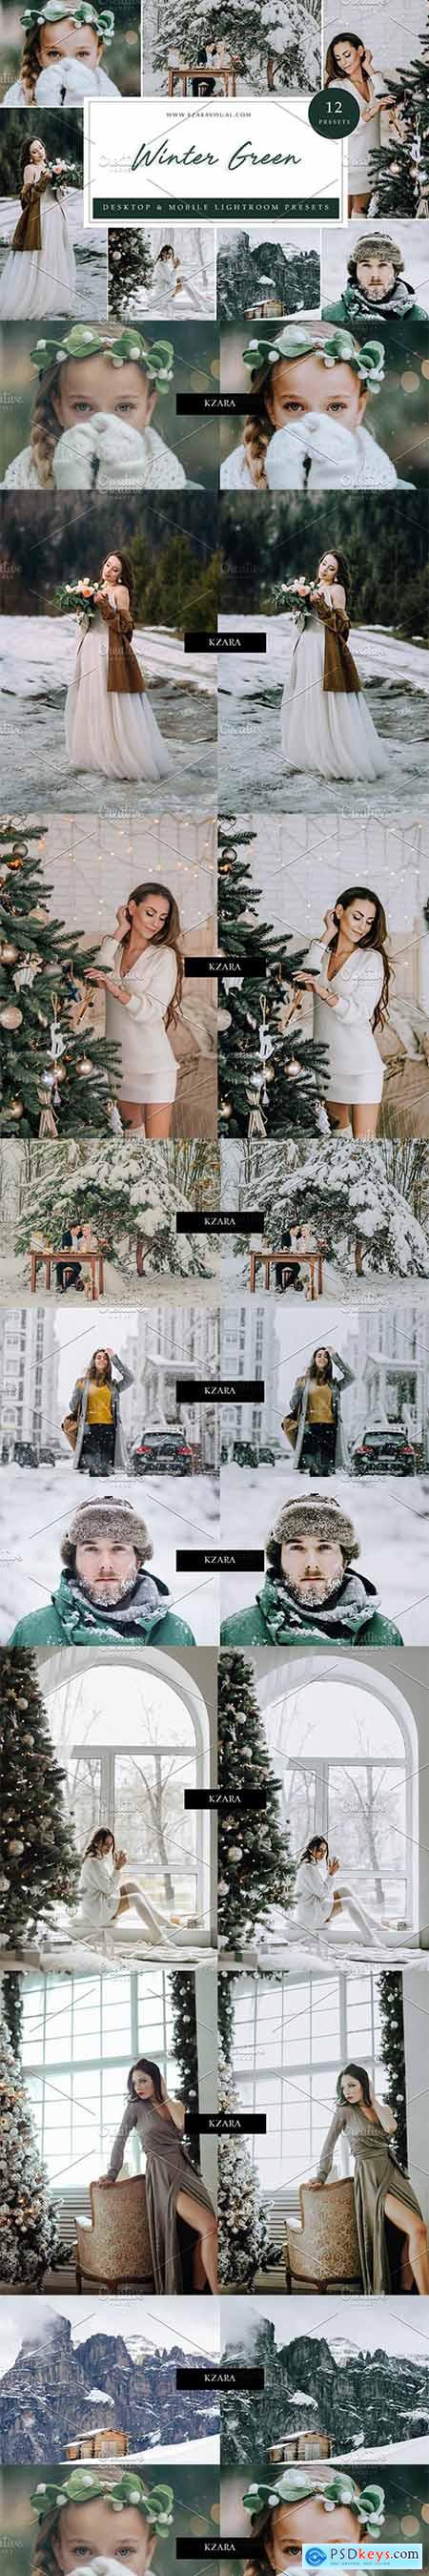 Creativemarket 12 x Lightroom Presets, Winter Green 5962772